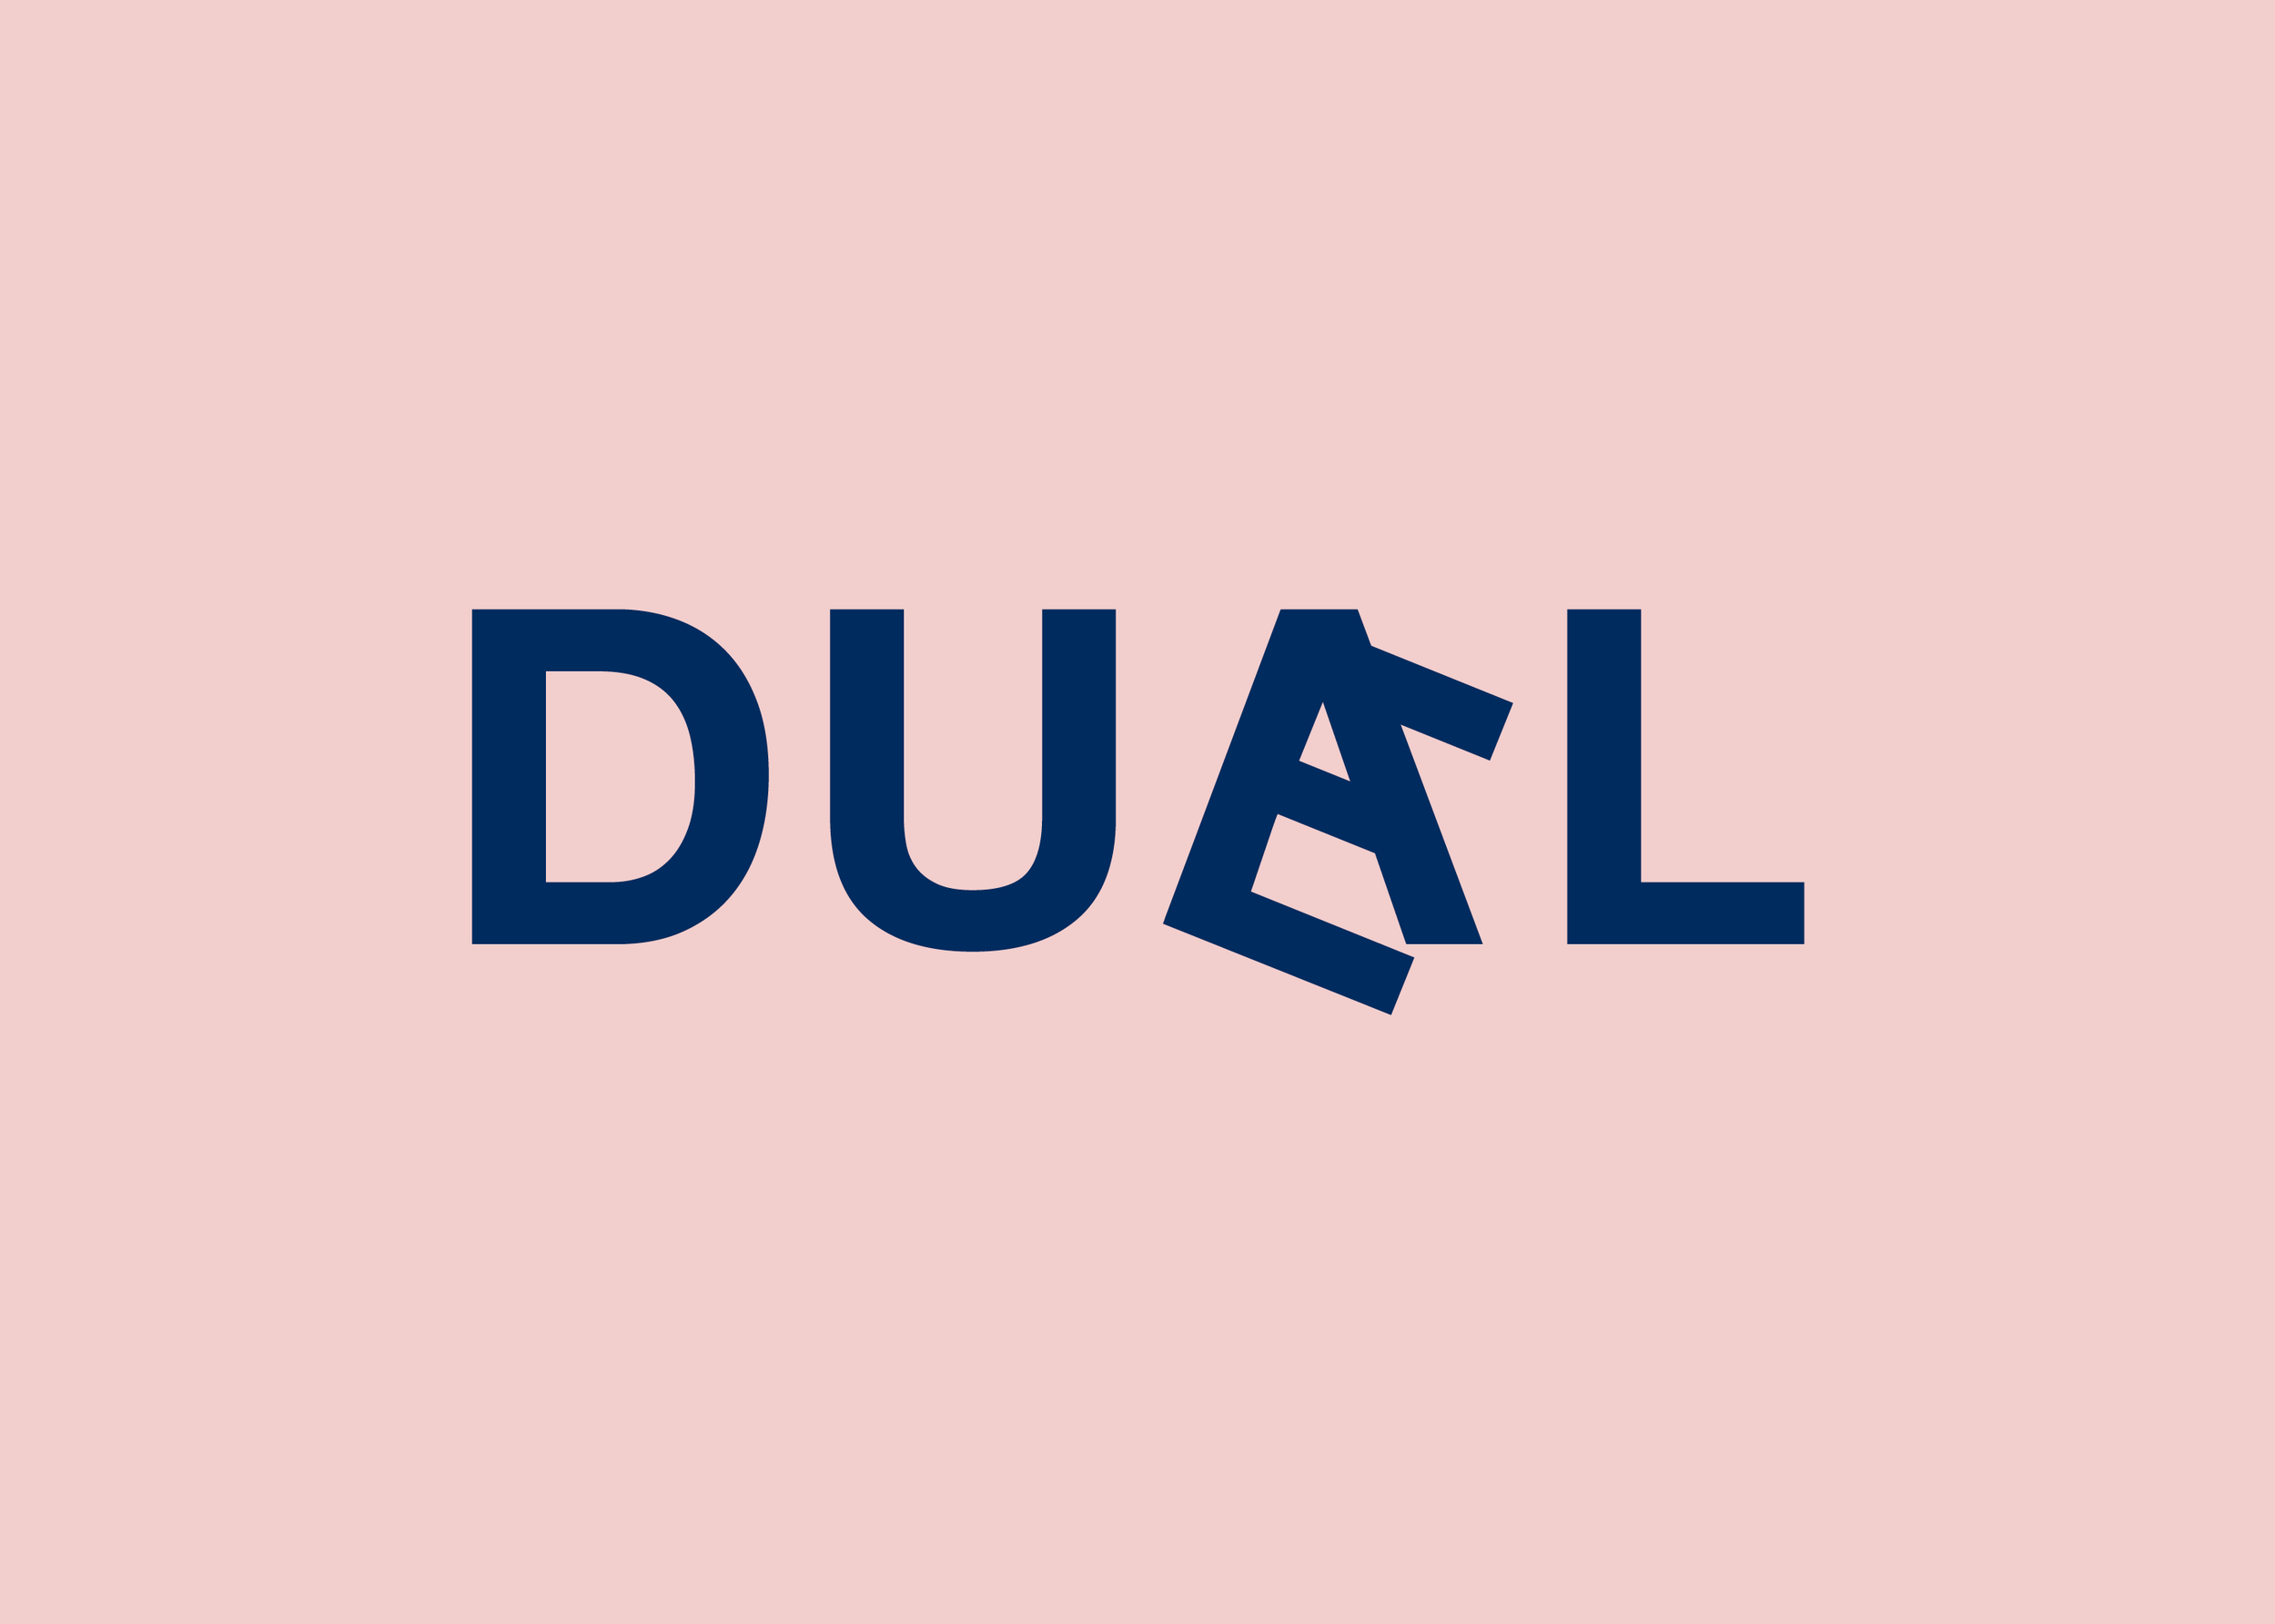 duael_flip11.png